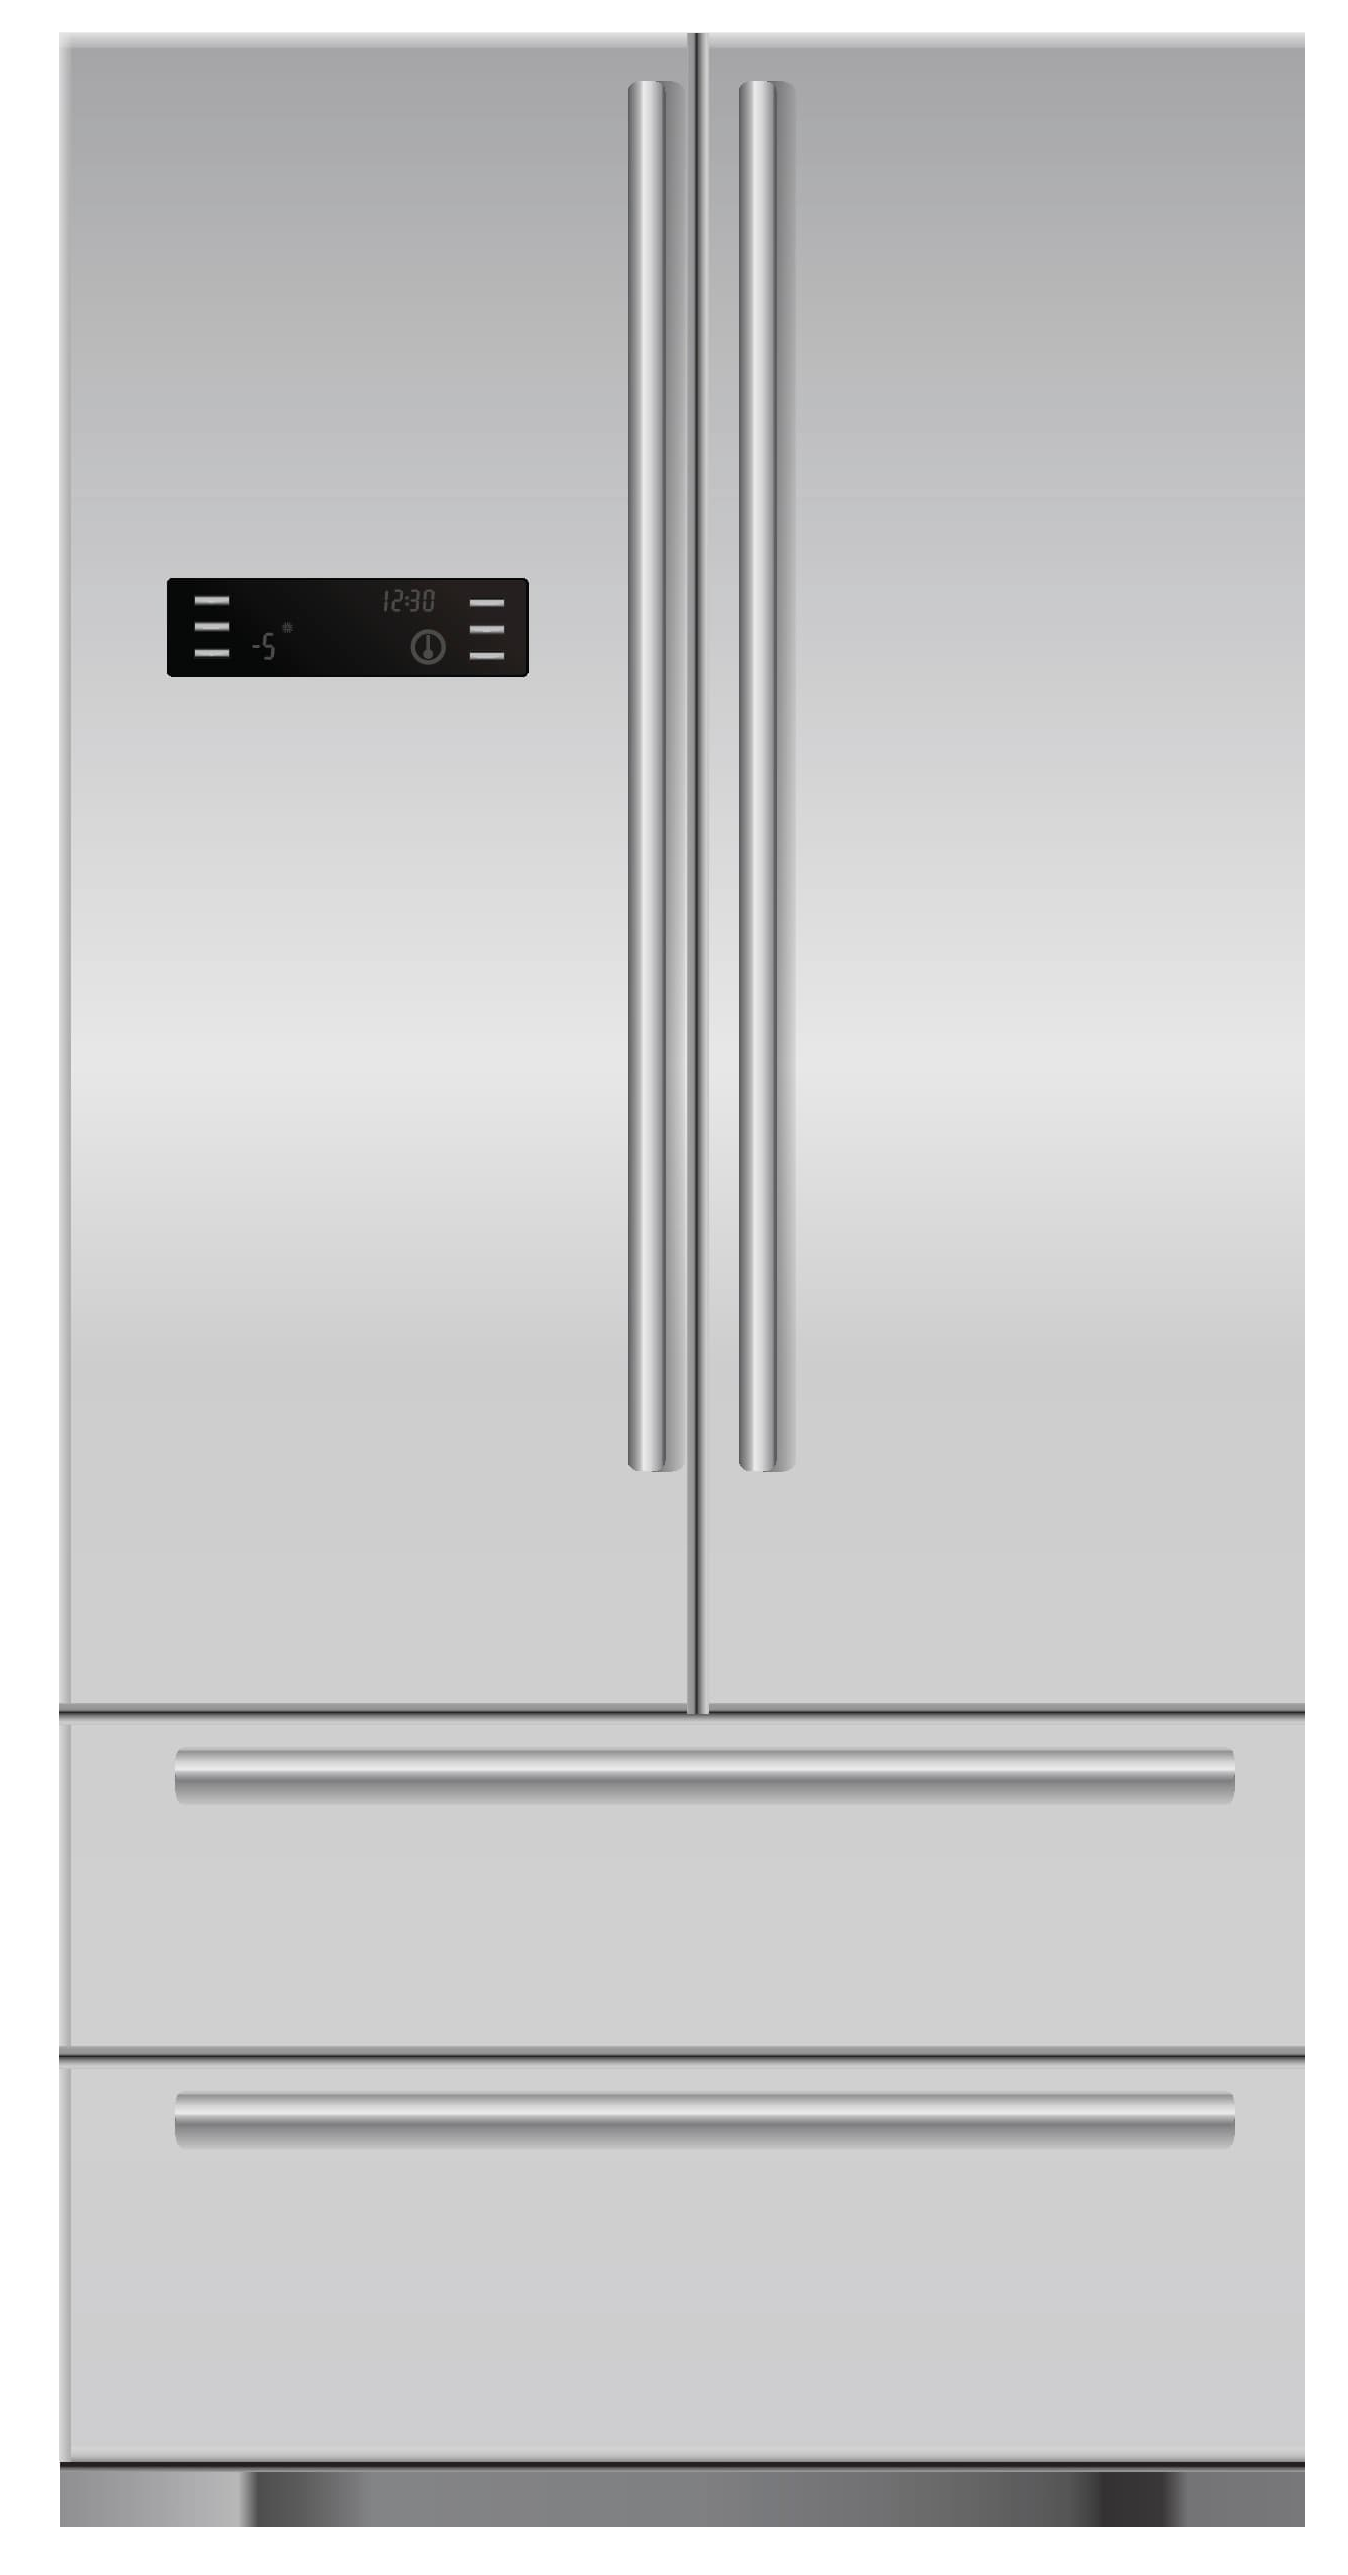 2 door fridge repair ottawa